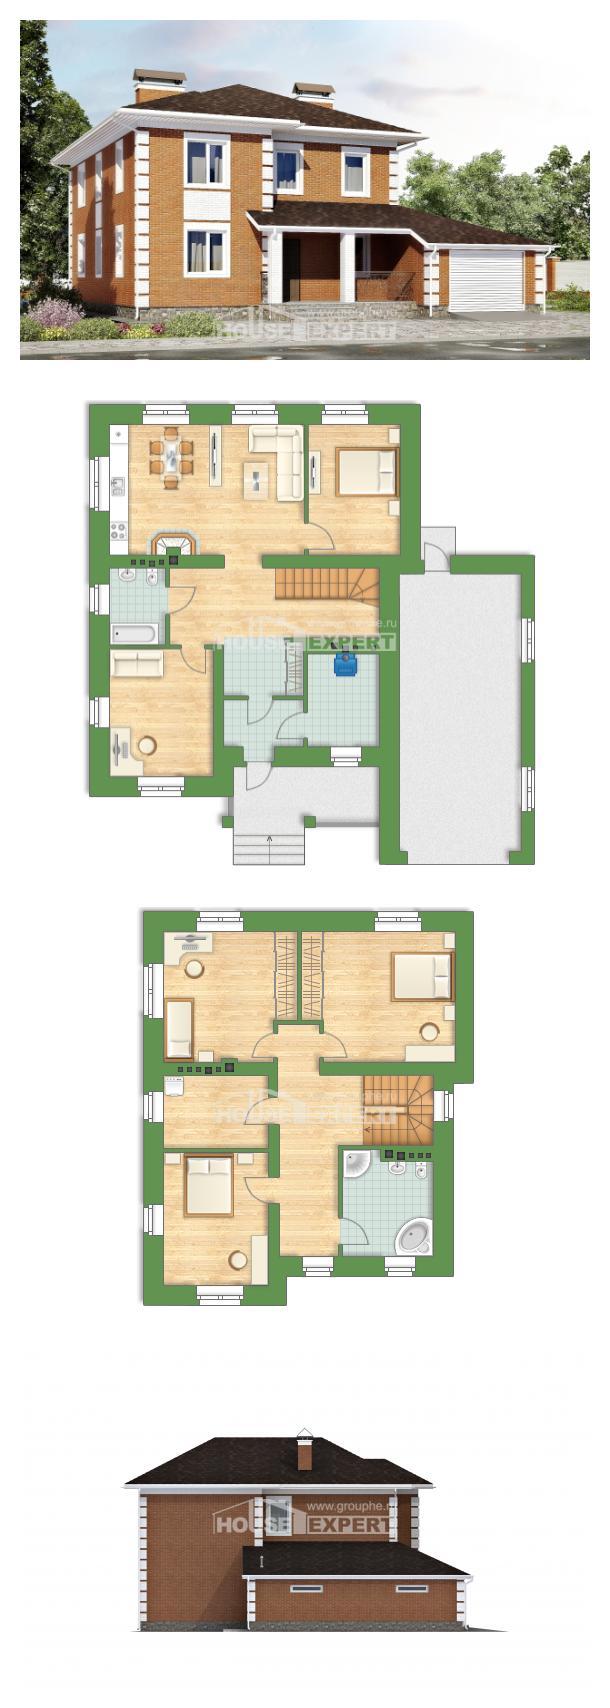 Проект дома 220-004-Л   House Expert